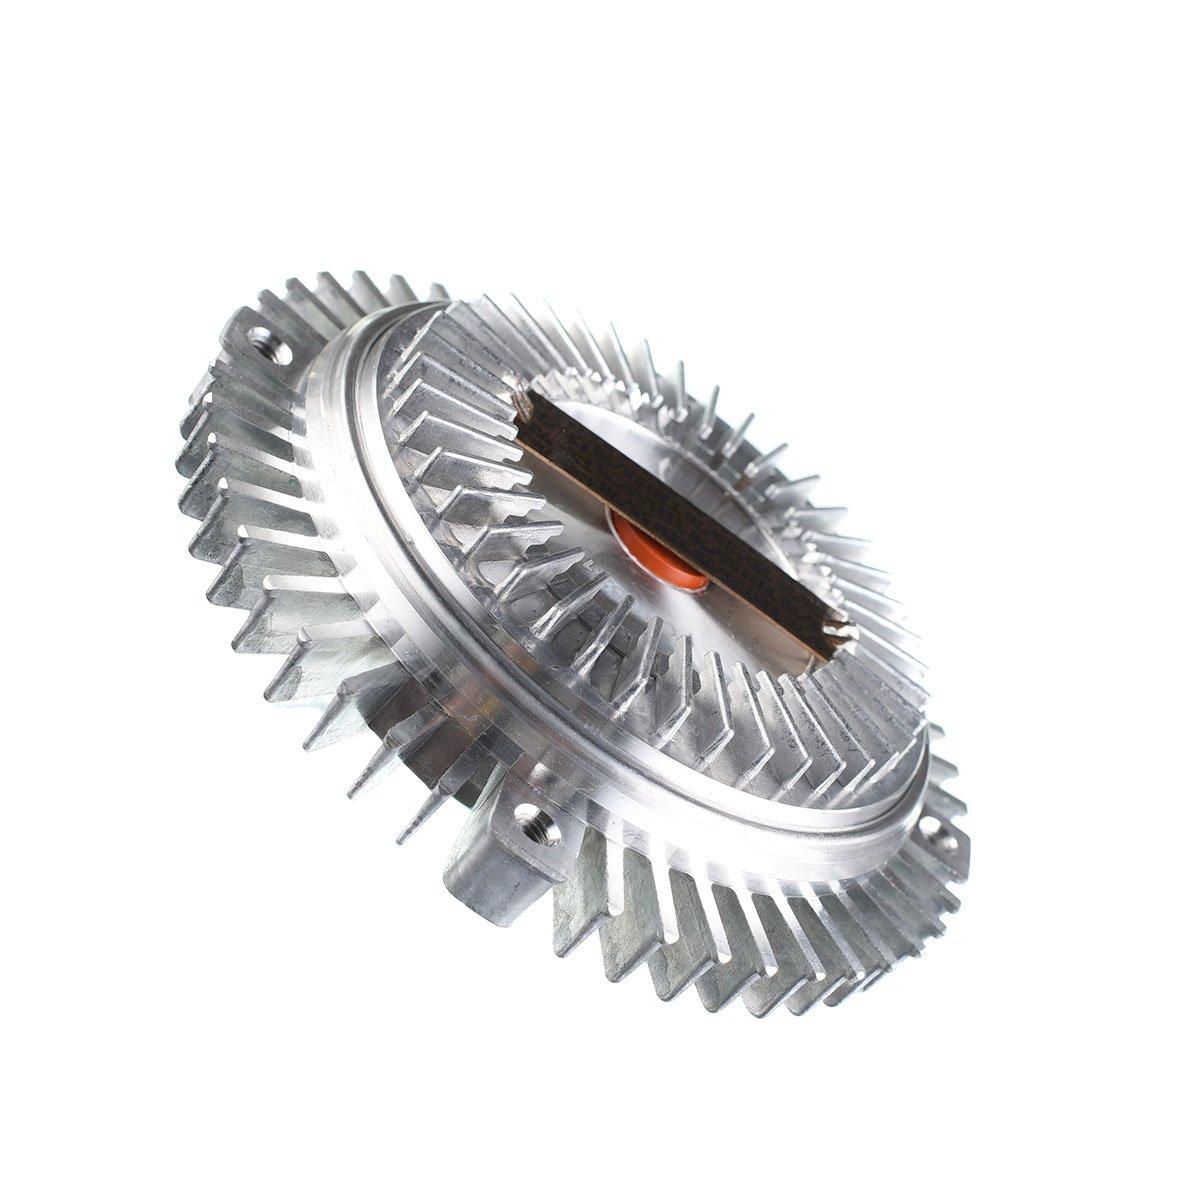 Viscokupplung K/ühlerl/üfter Ventilator f/ür E30 E36 E21 E23 E24 E12 E28 E34 E39 M5 Z1 ab Bj.1973//08-2000//09